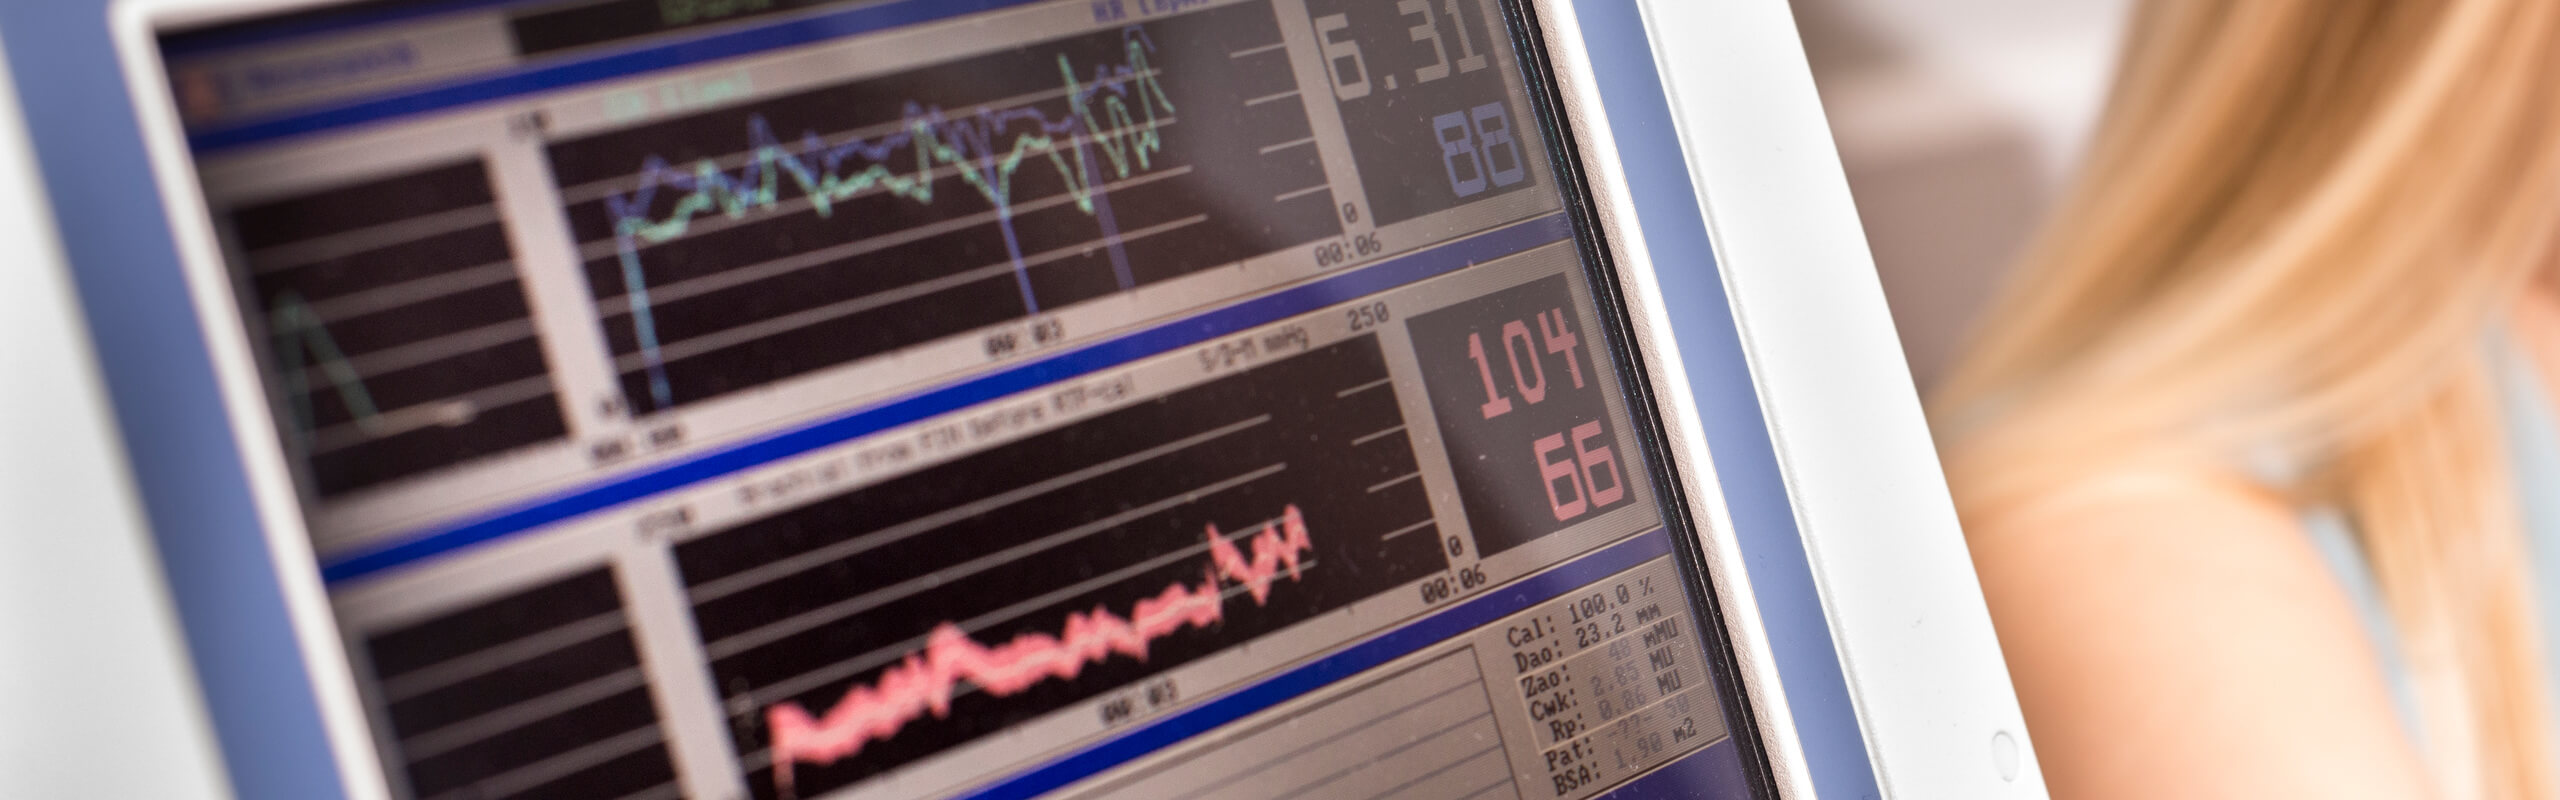 a health monitor